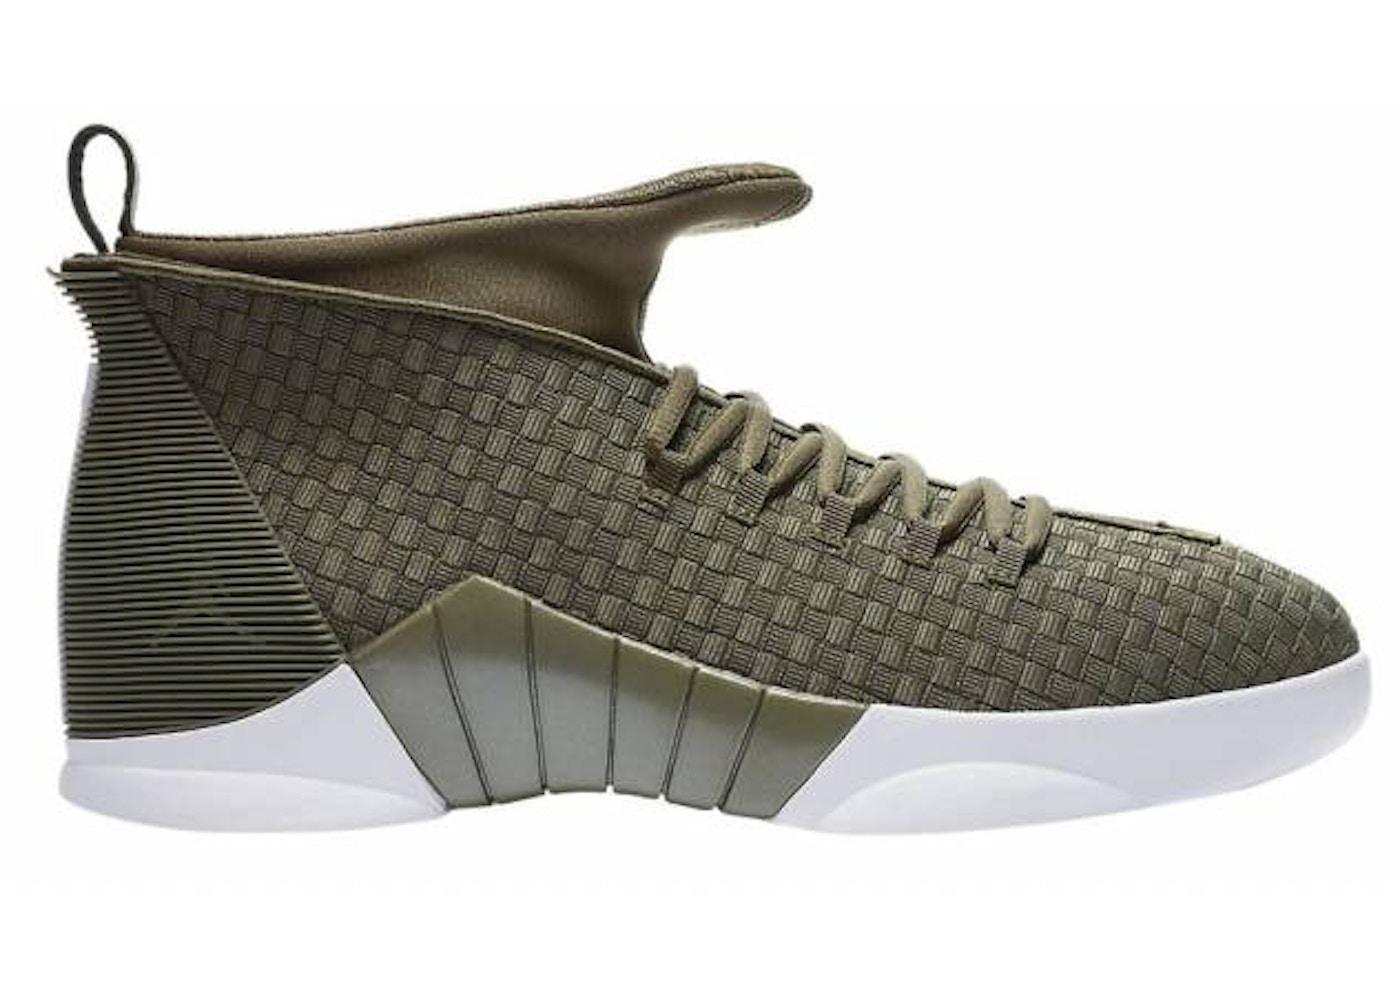 6e21cb476cb0 Buy Air Jordan 15 Shoes   Deadstock Sneakers